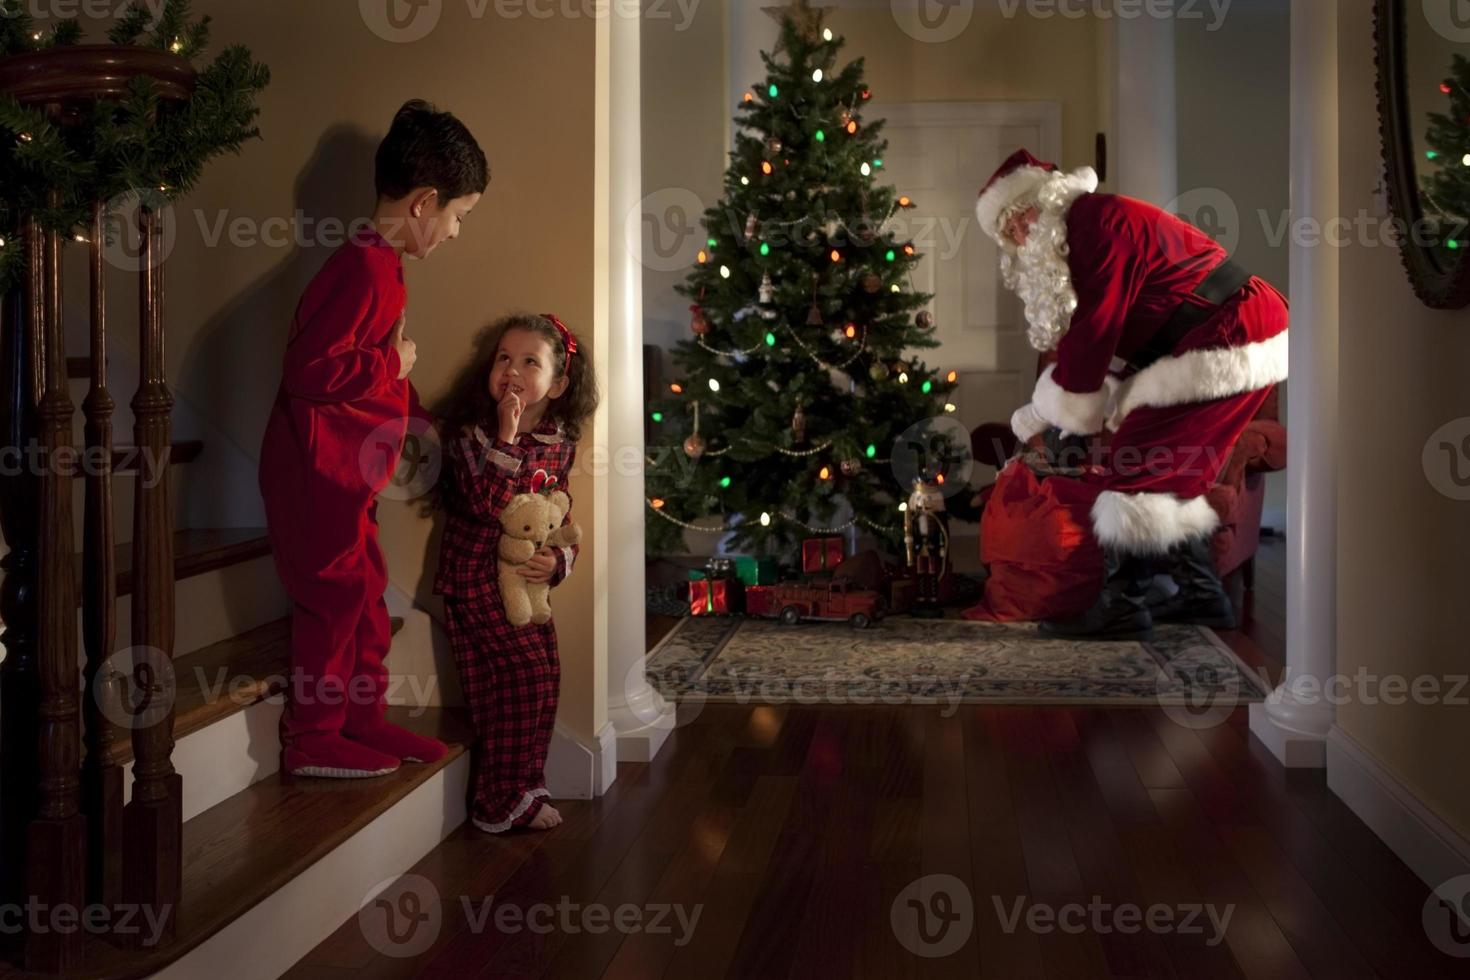 Visit from Santa Claus photo